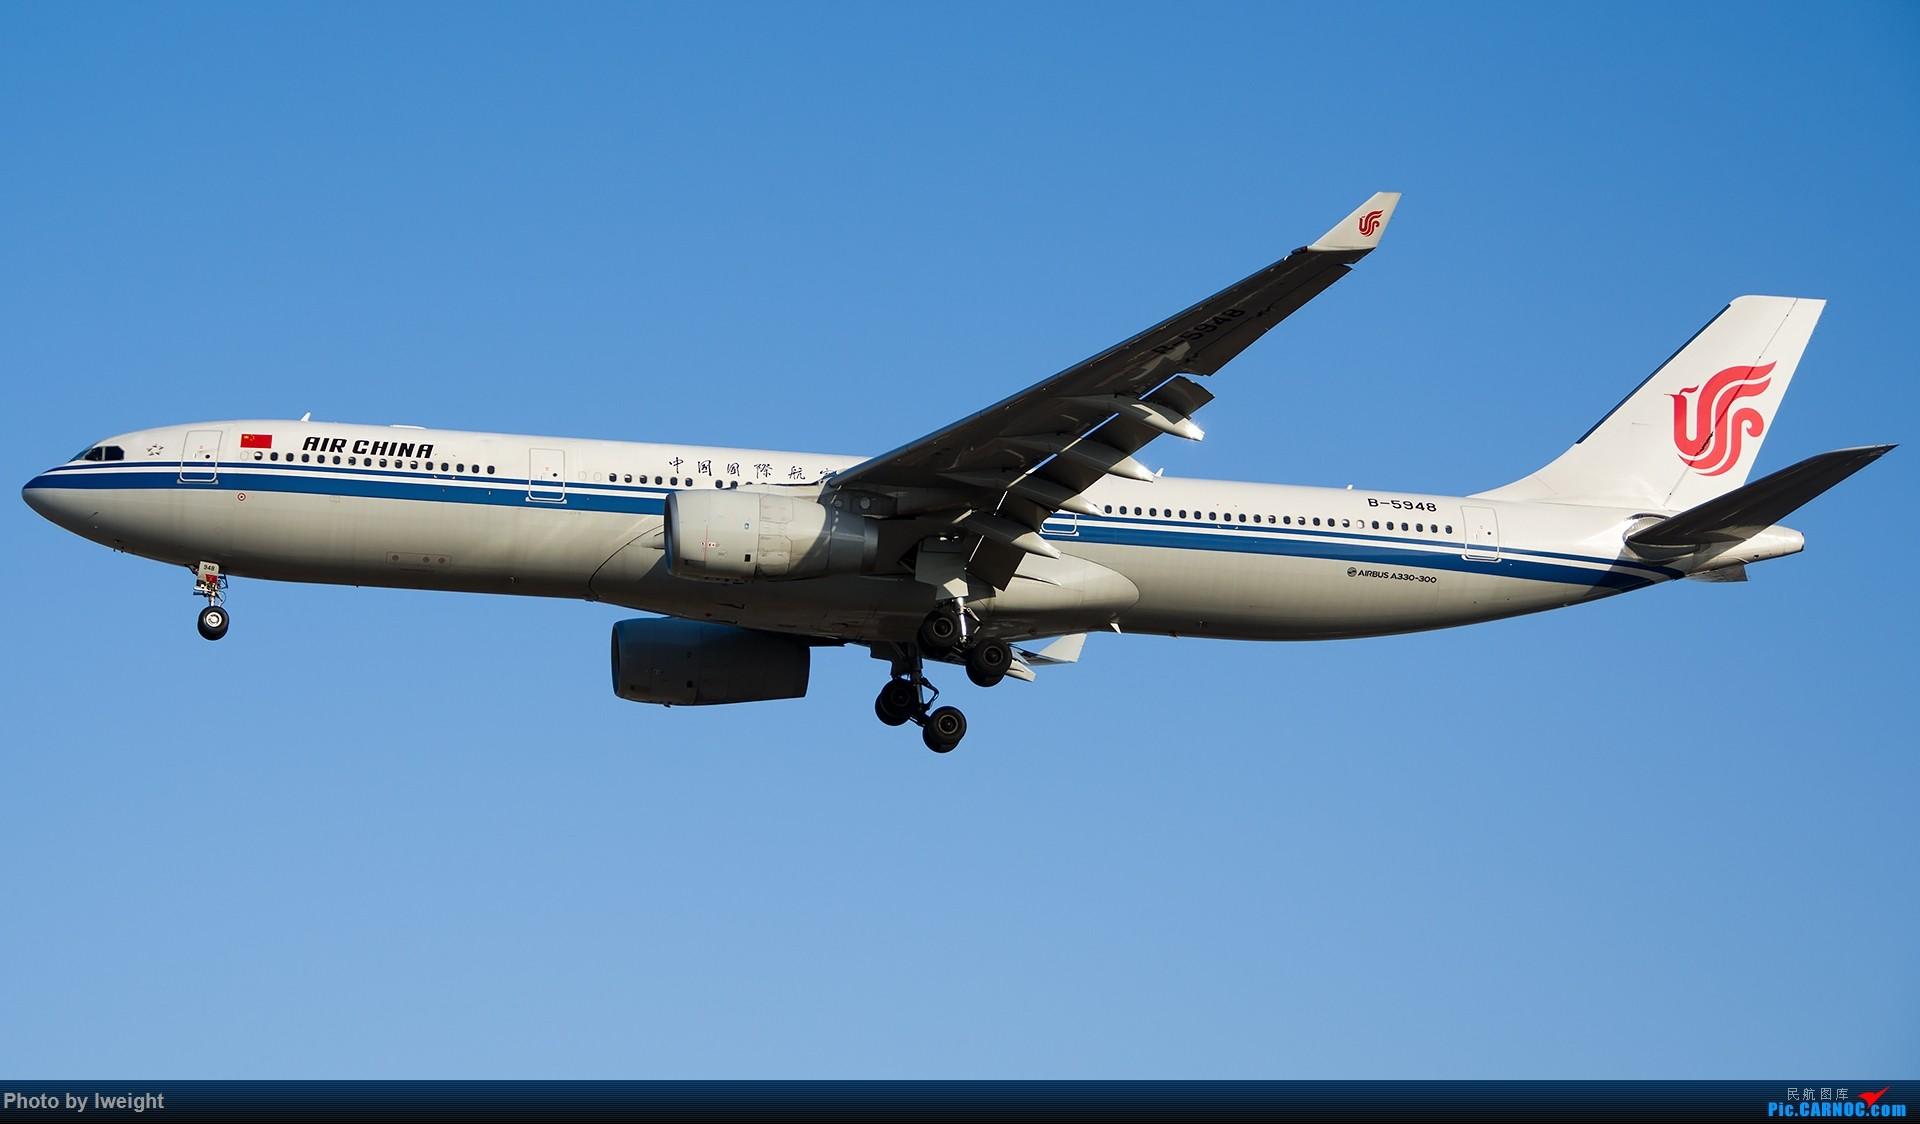 Re:[原创]北京难得的好天气,随手拍了一些渣图【2015-01-27】 AIRBUS A330-300 B-5948 中国北京首都国际机场